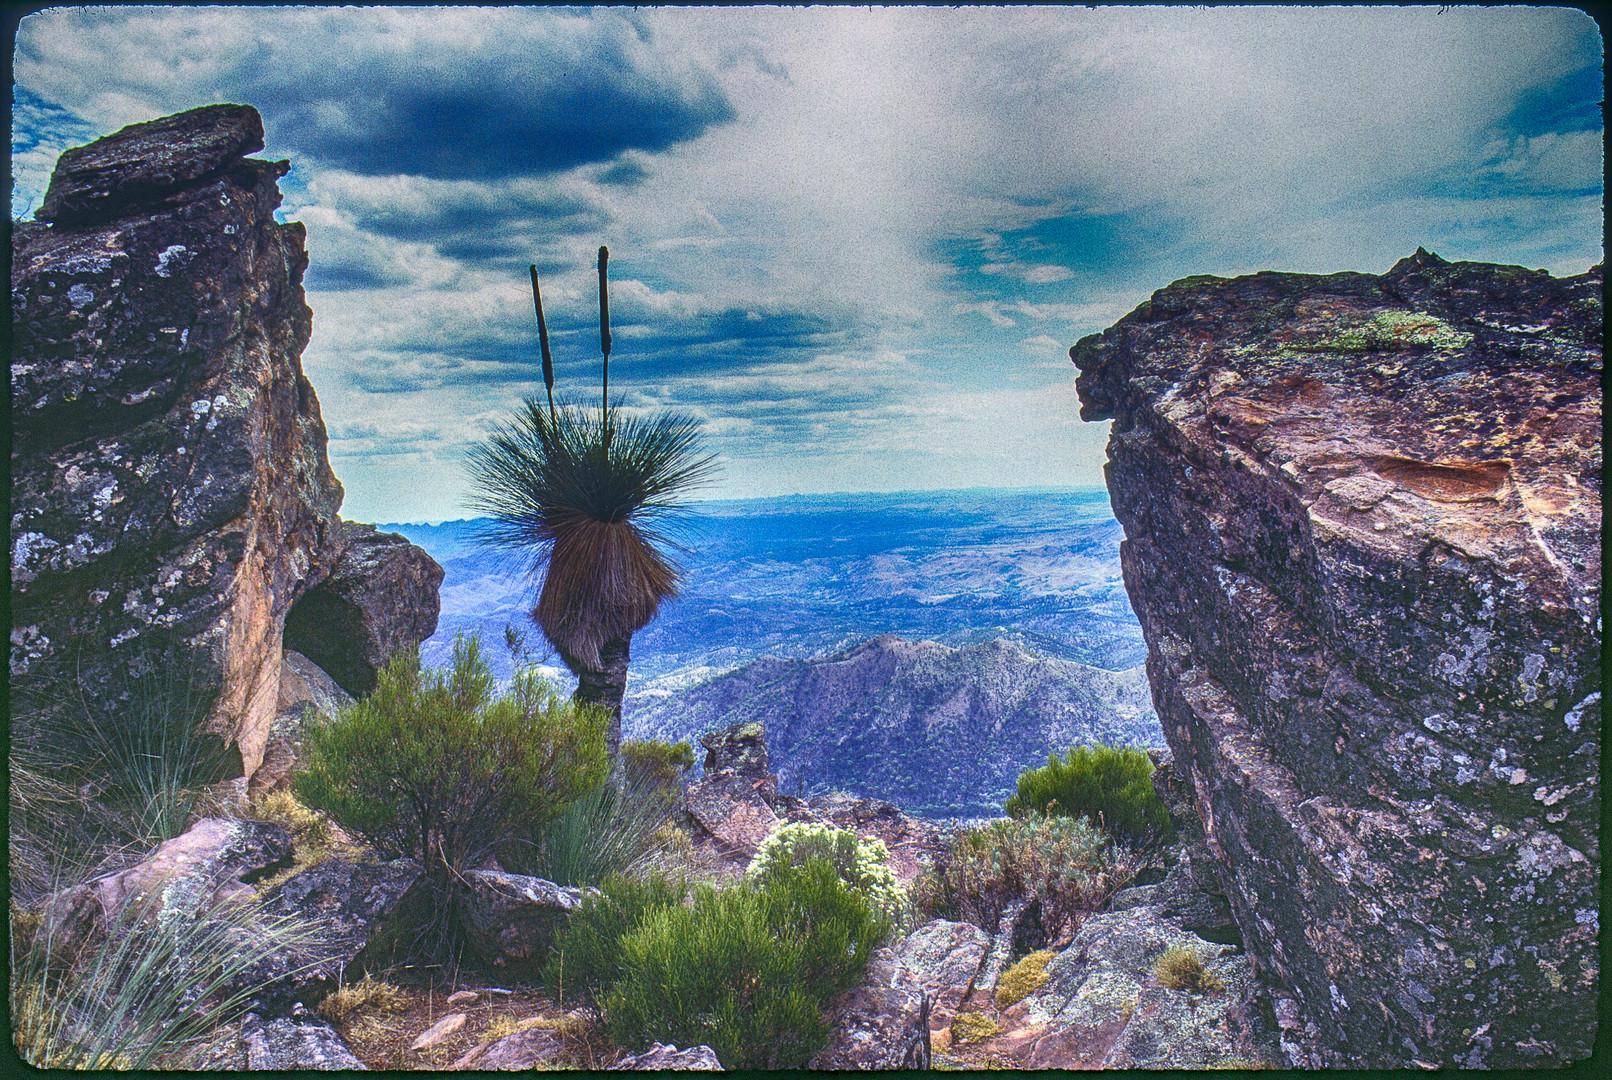 Australia No. 1 - Flinders Ranges